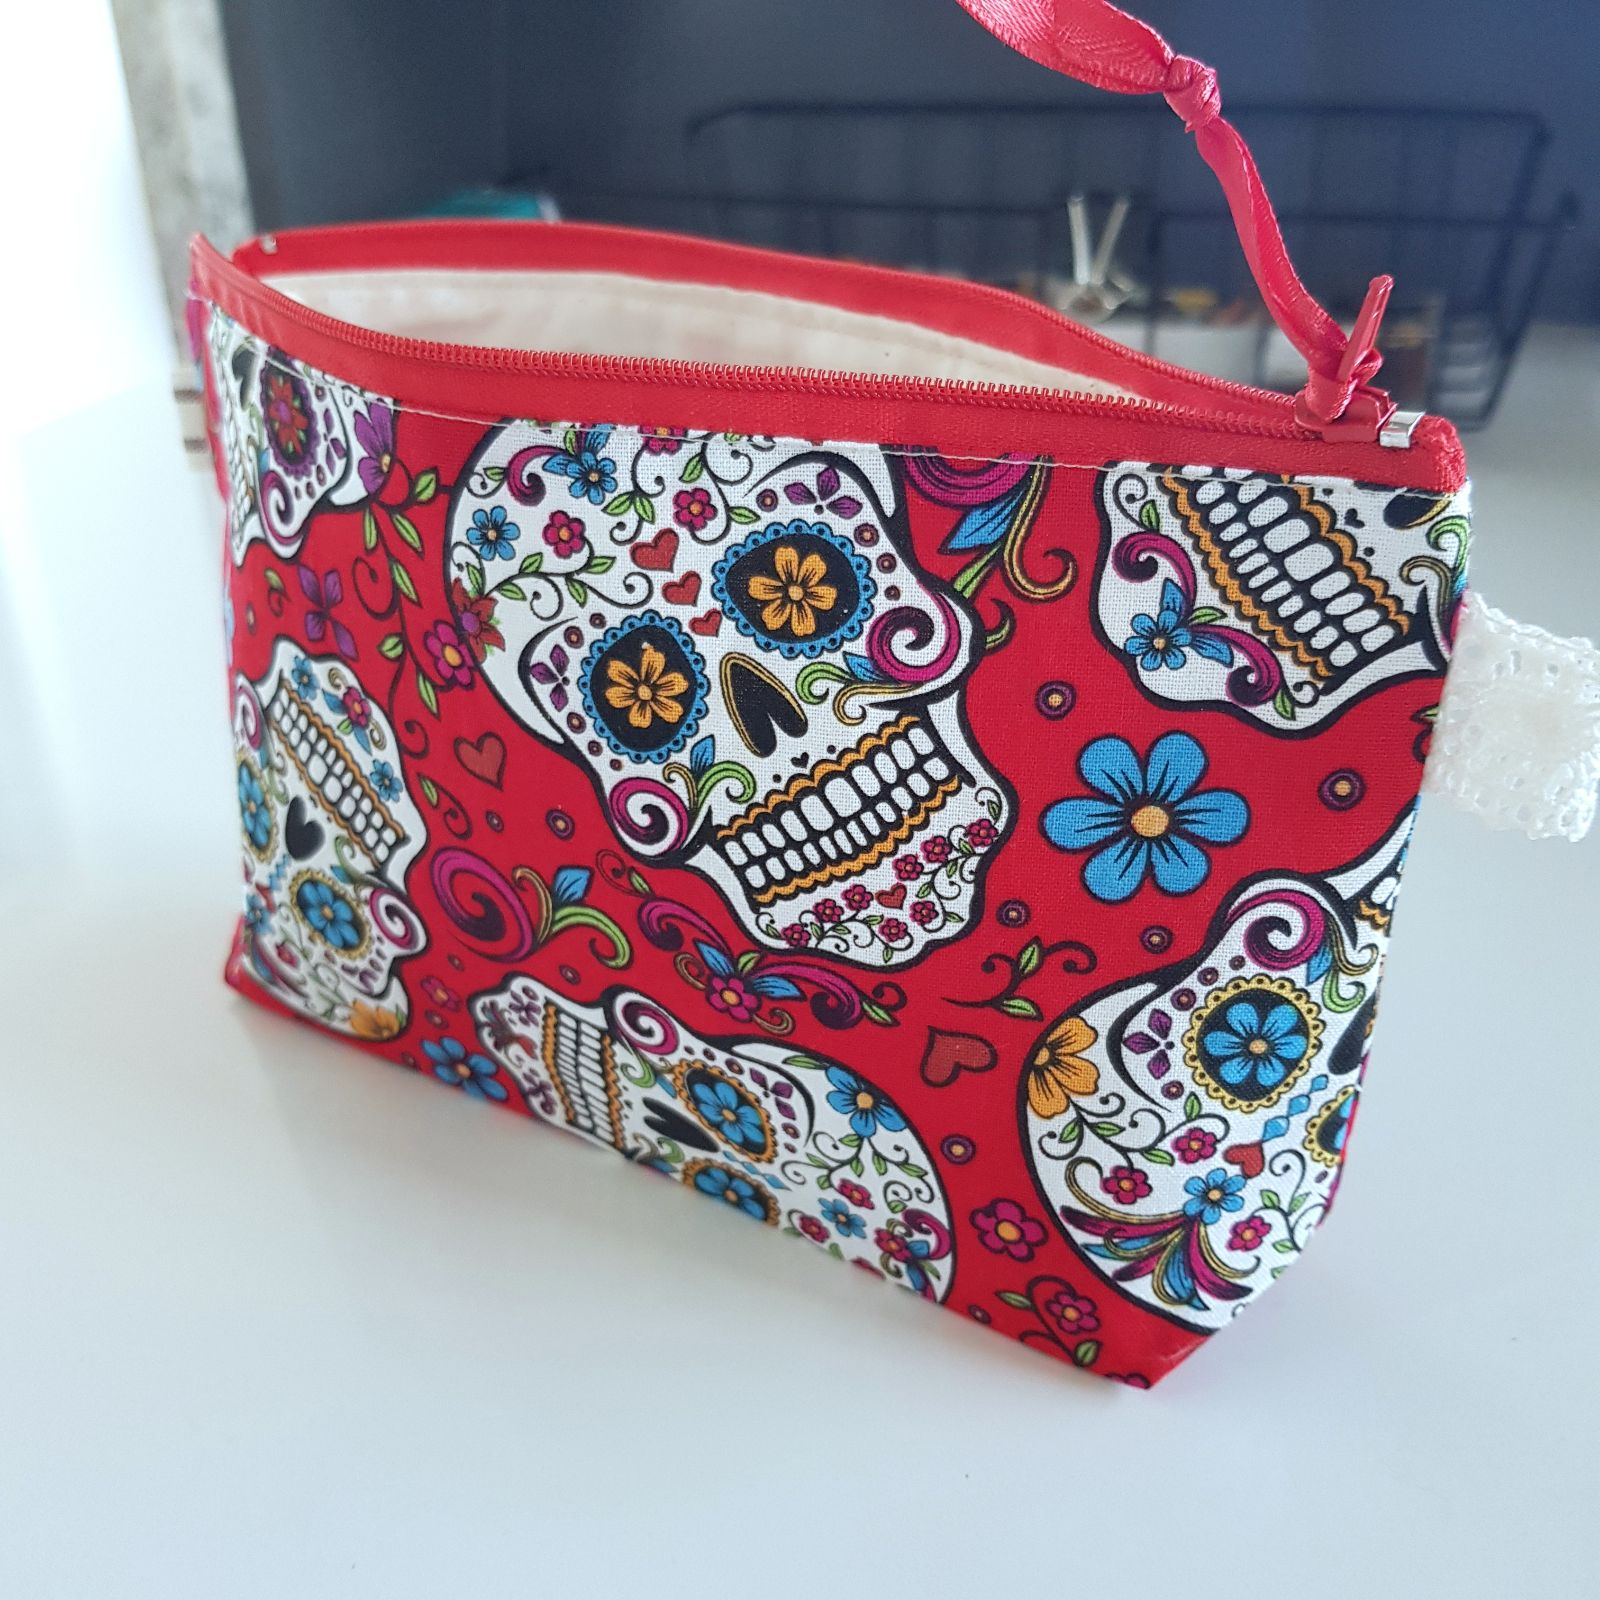 sugar skull(red)zipper pouch